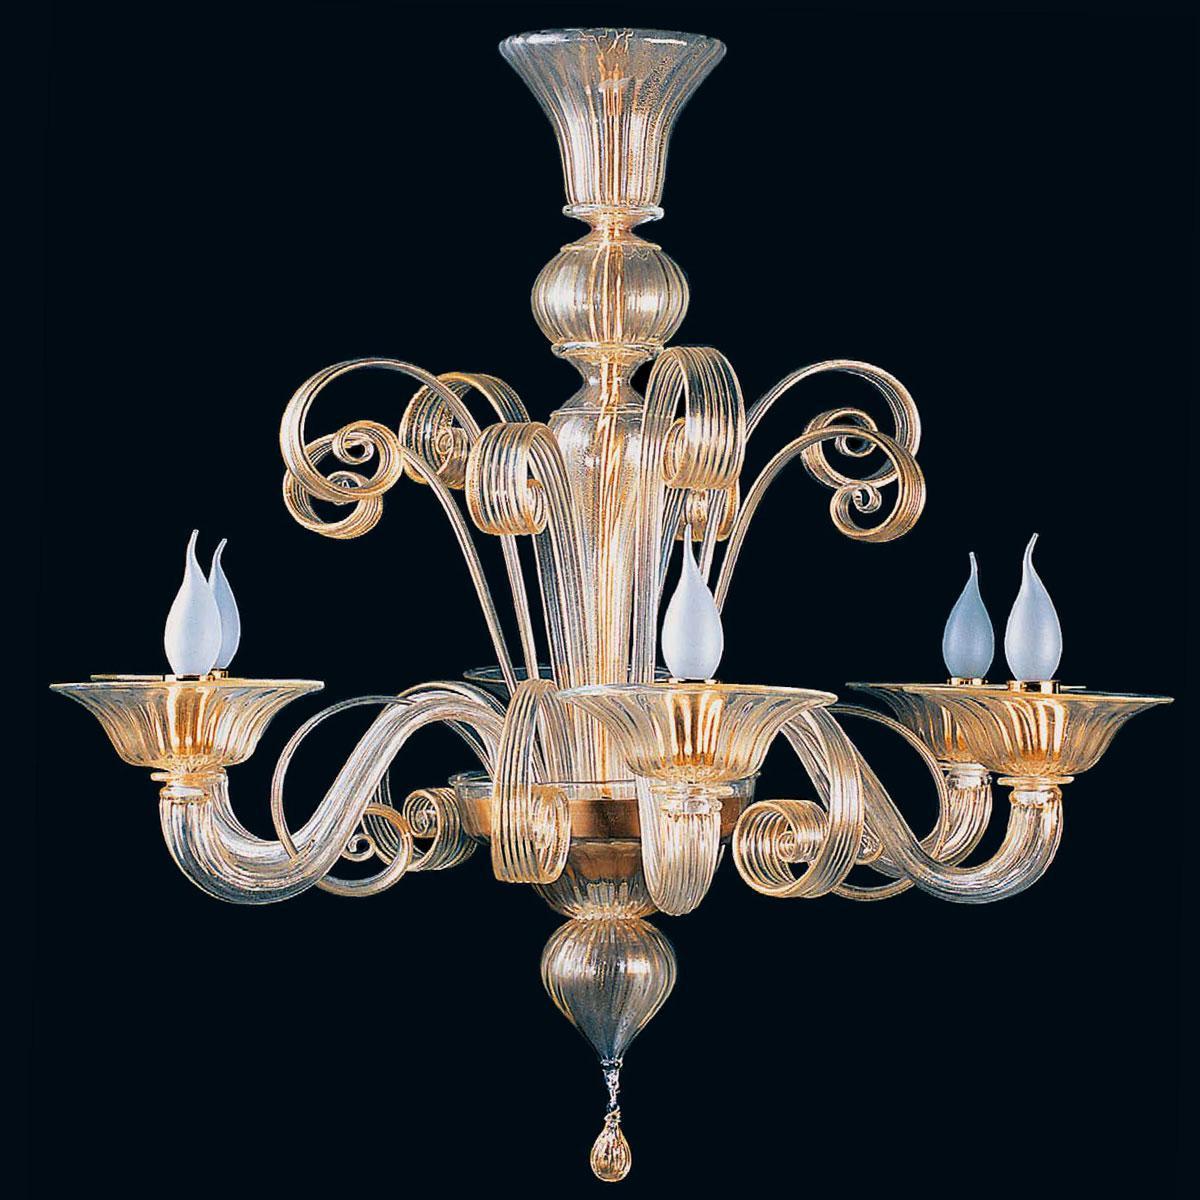 """Ima"" lustre en cristal de Murano - 6 lumières - or"